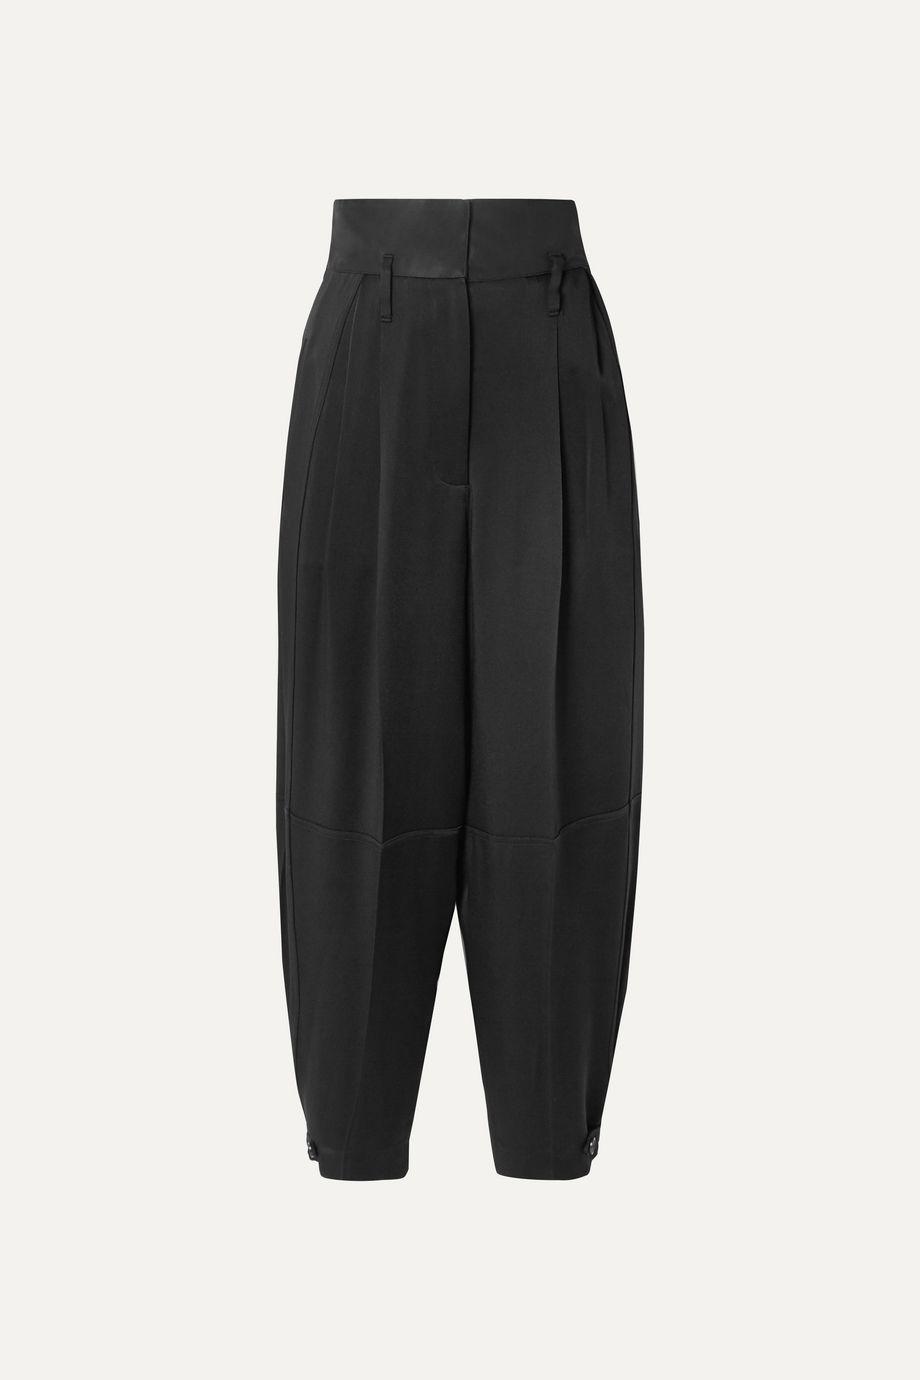 Givenchy Gabardine-paneled satin-crepe tapered pants